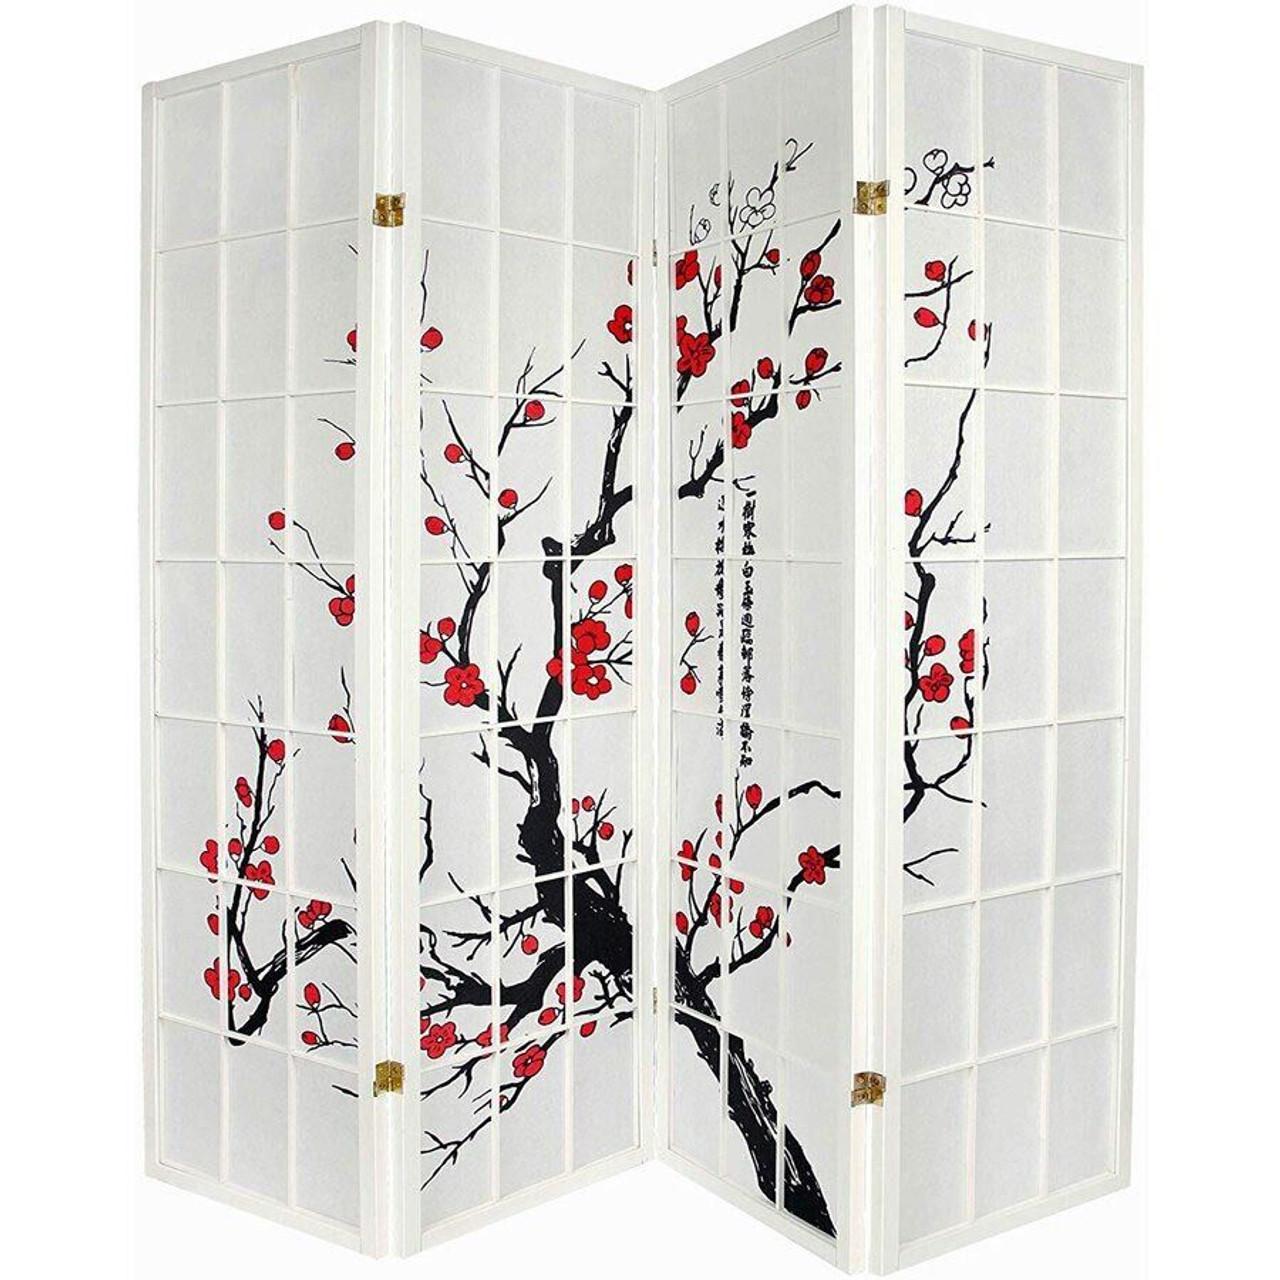 Room Divider 4 Panels Red Blossom Design White Color